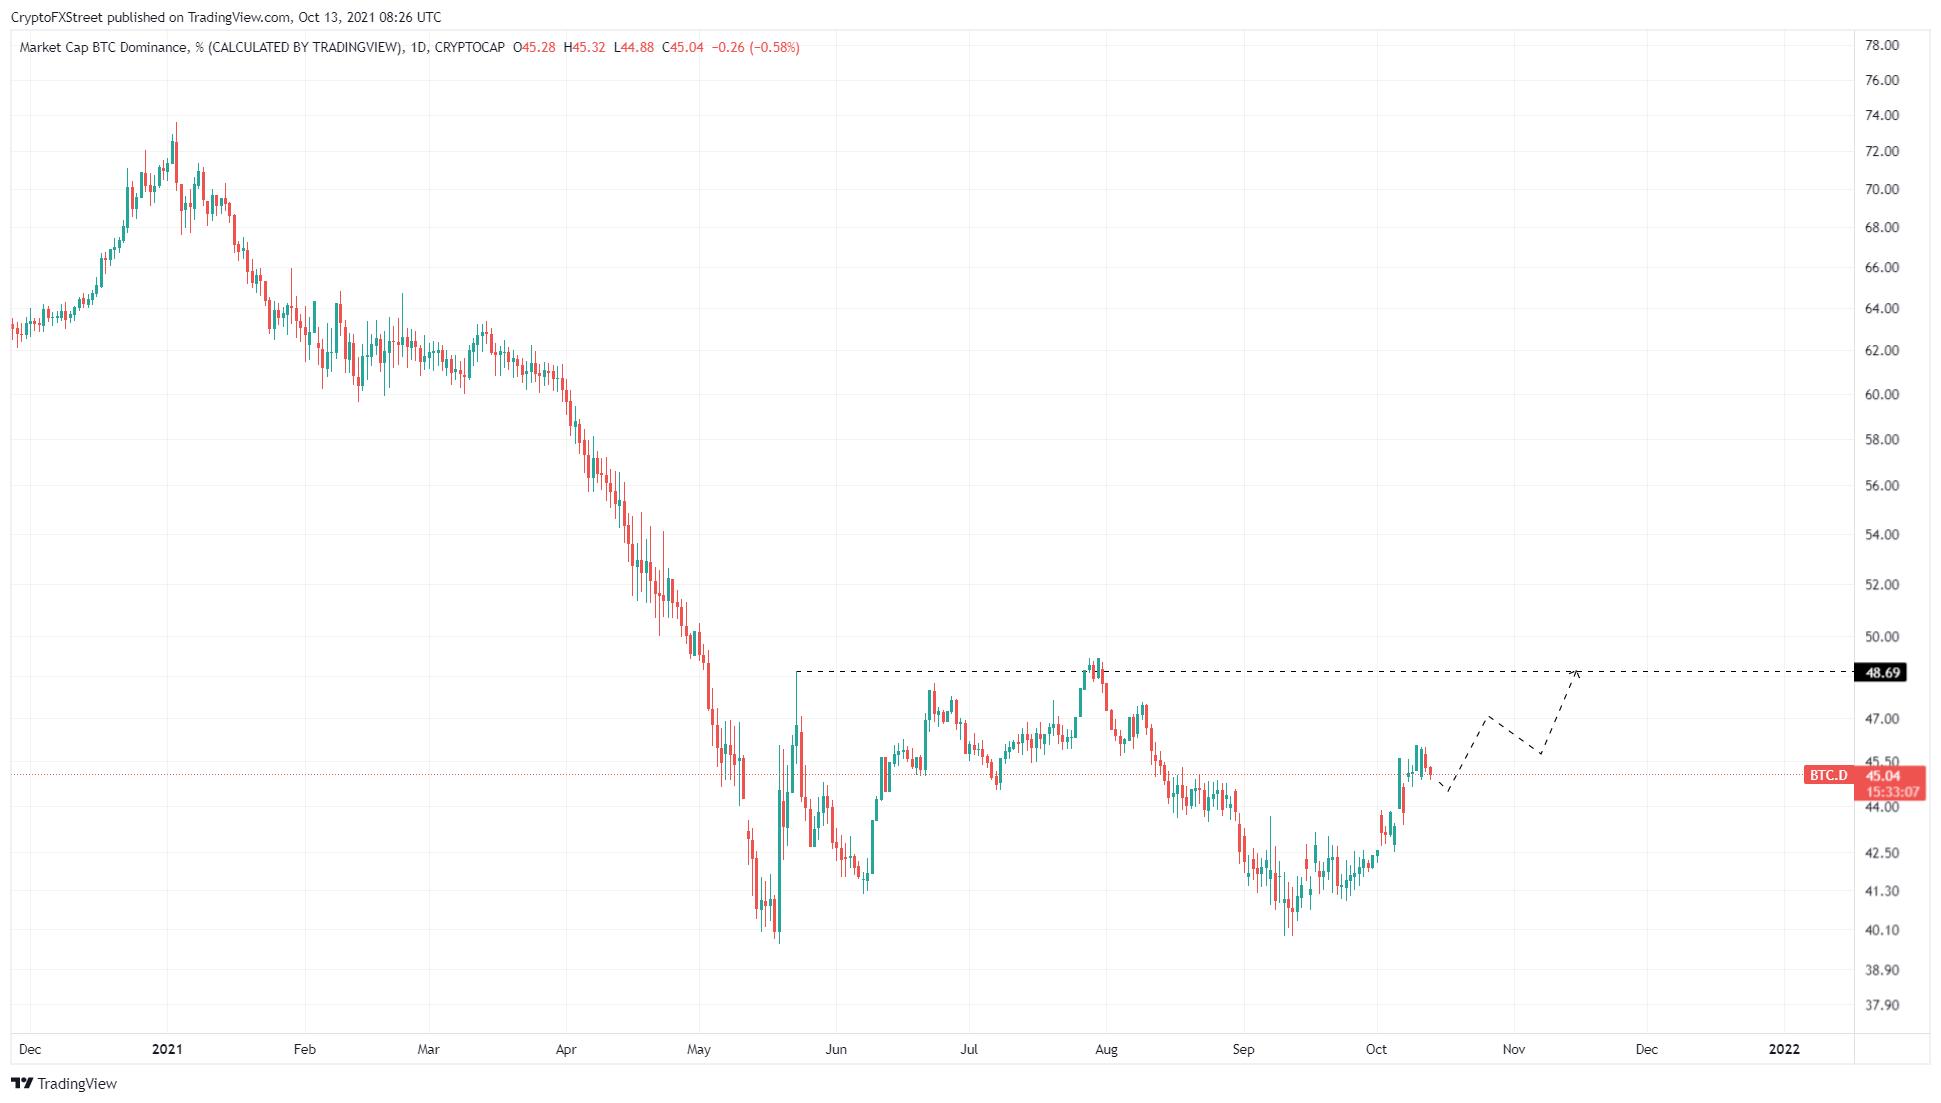 BTC dominance chart